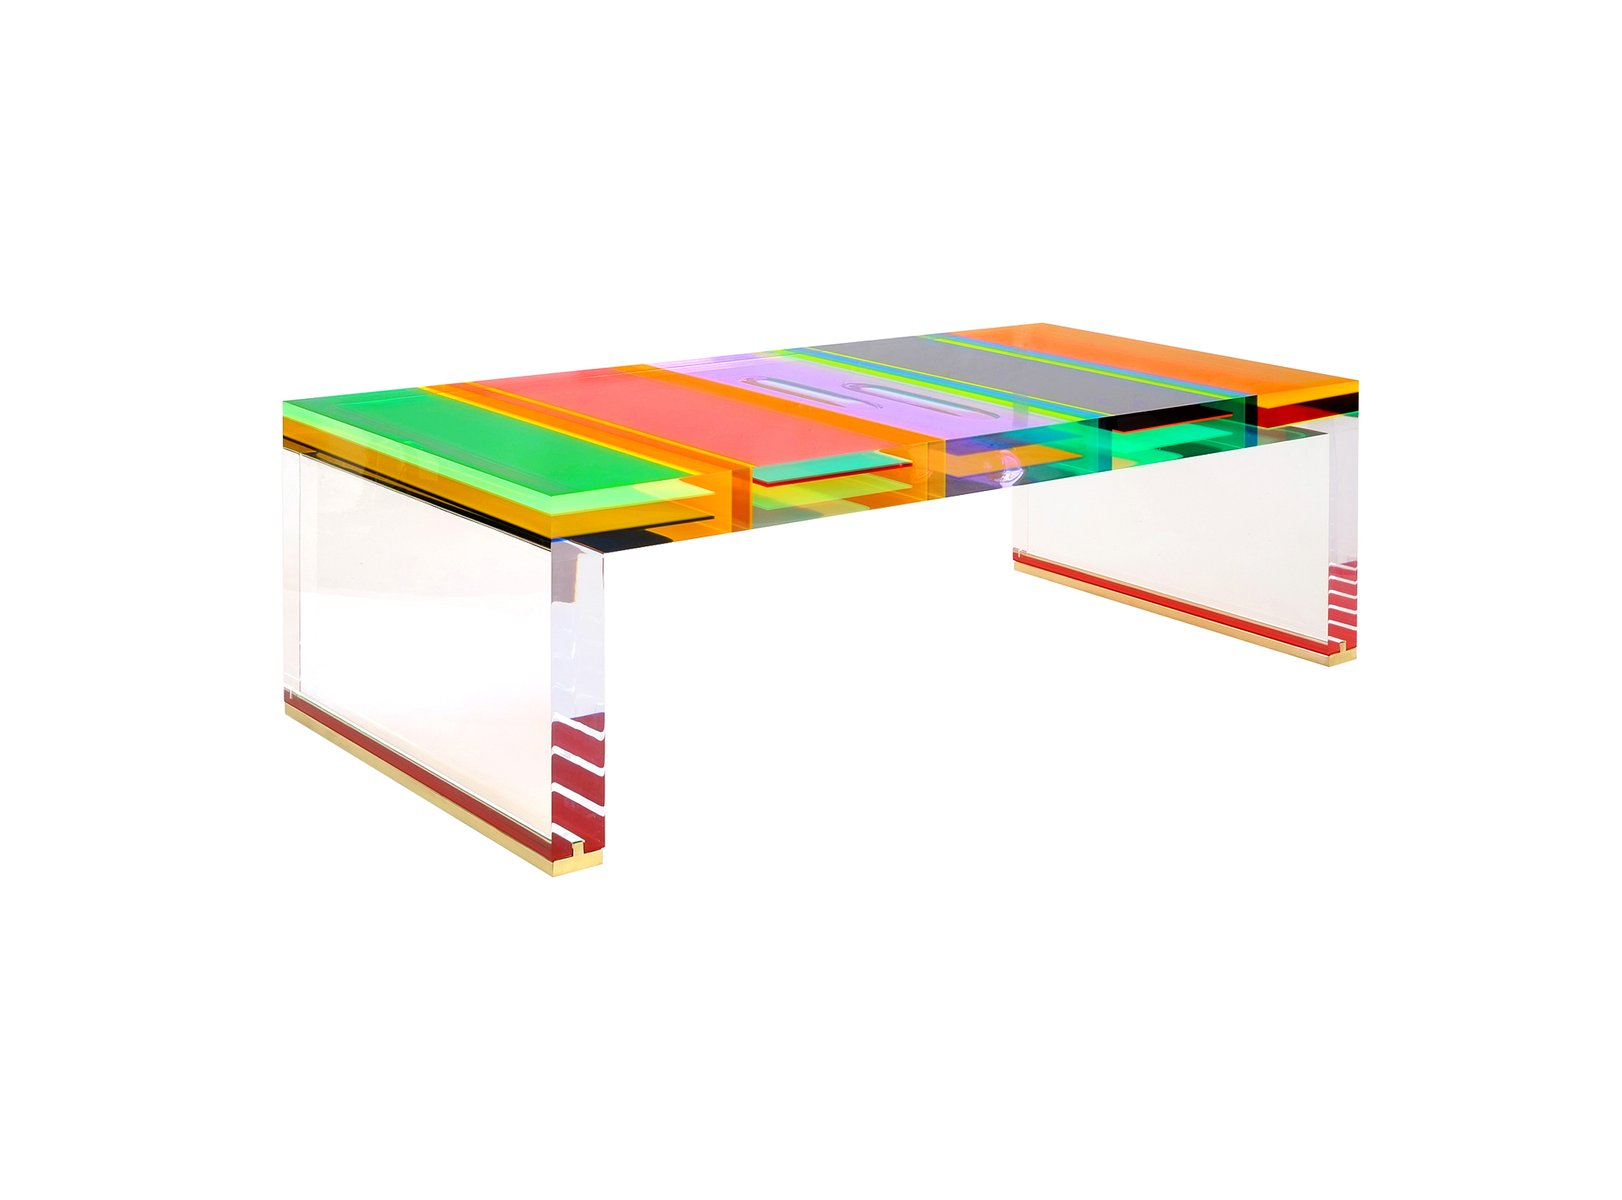 Table basse dna en plexiglas par studio superego en vente for Table basse en plexiglas